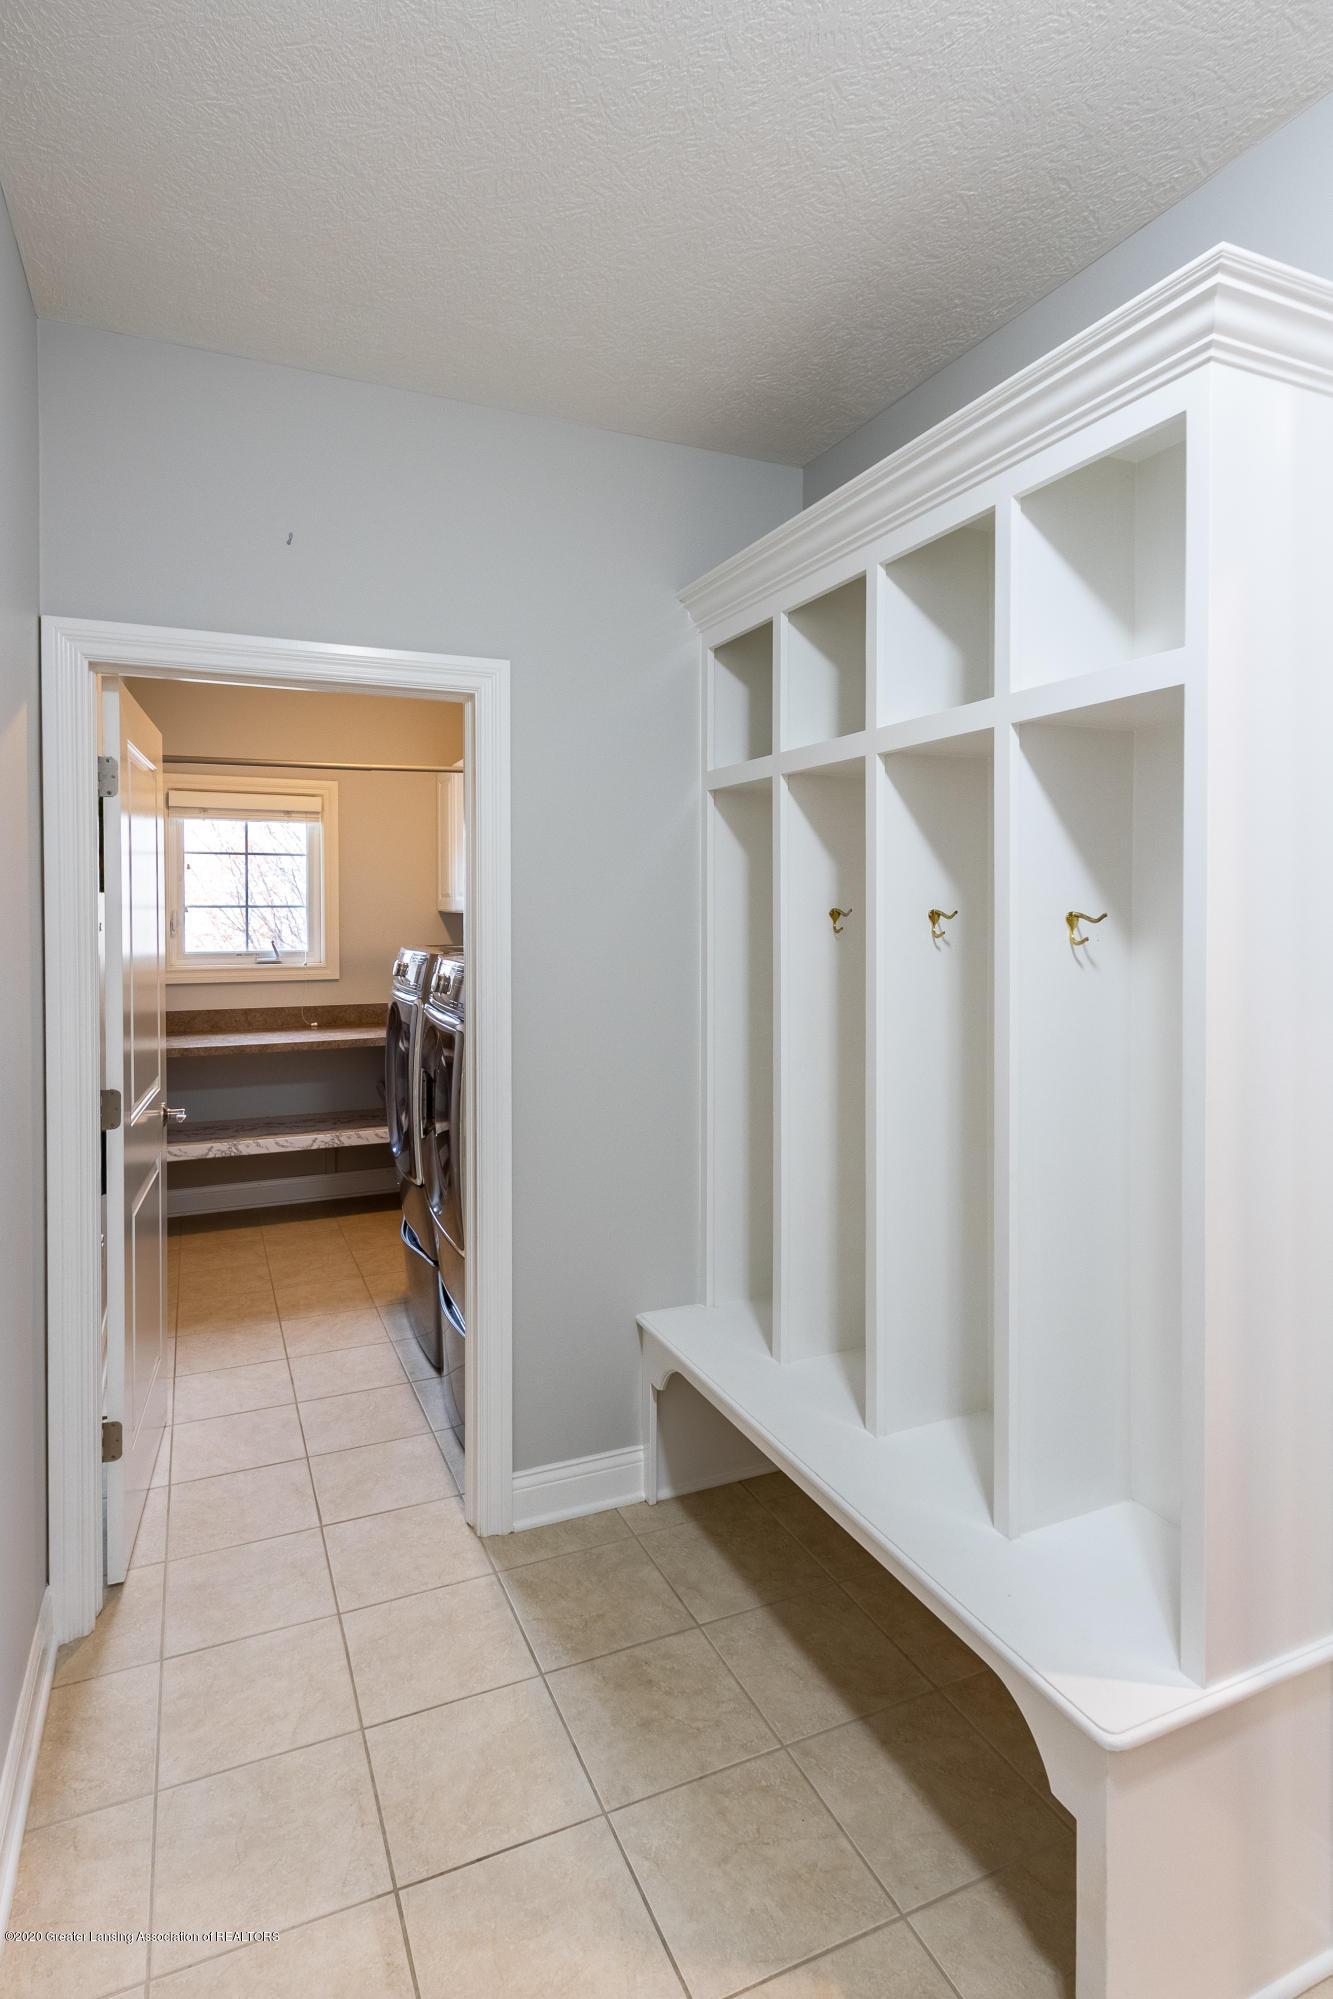 3929 Baulistrol Dr - Mud Room/Laundry Room - 29